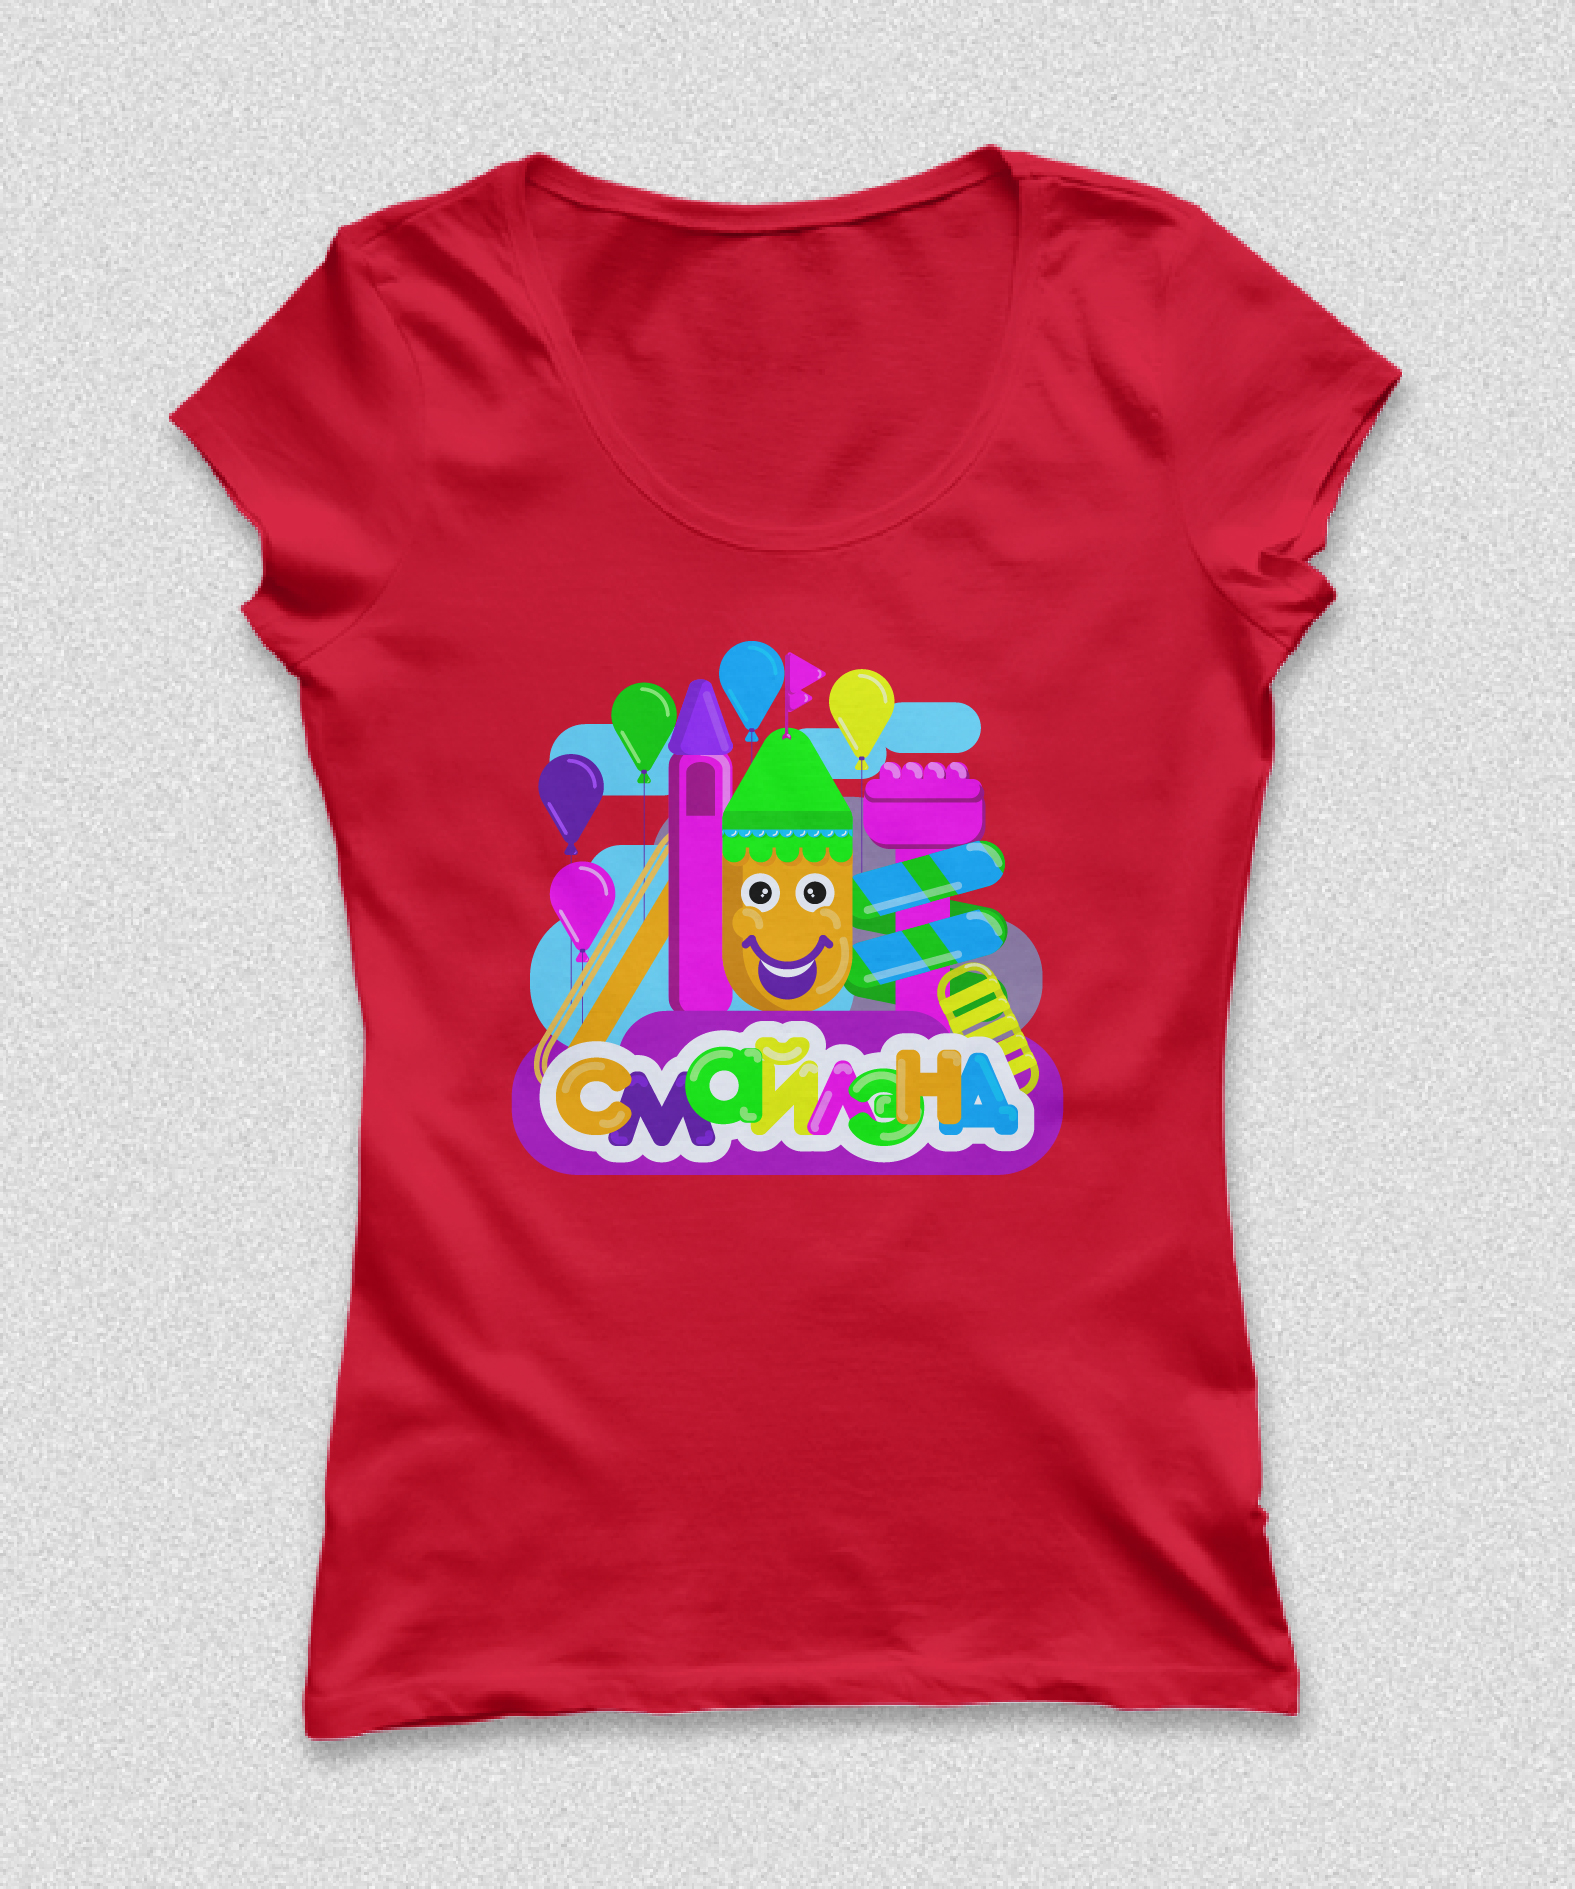 Логотип, стиль для детского игрового центра. фото f_0755a4fbc5811cf9.jpg